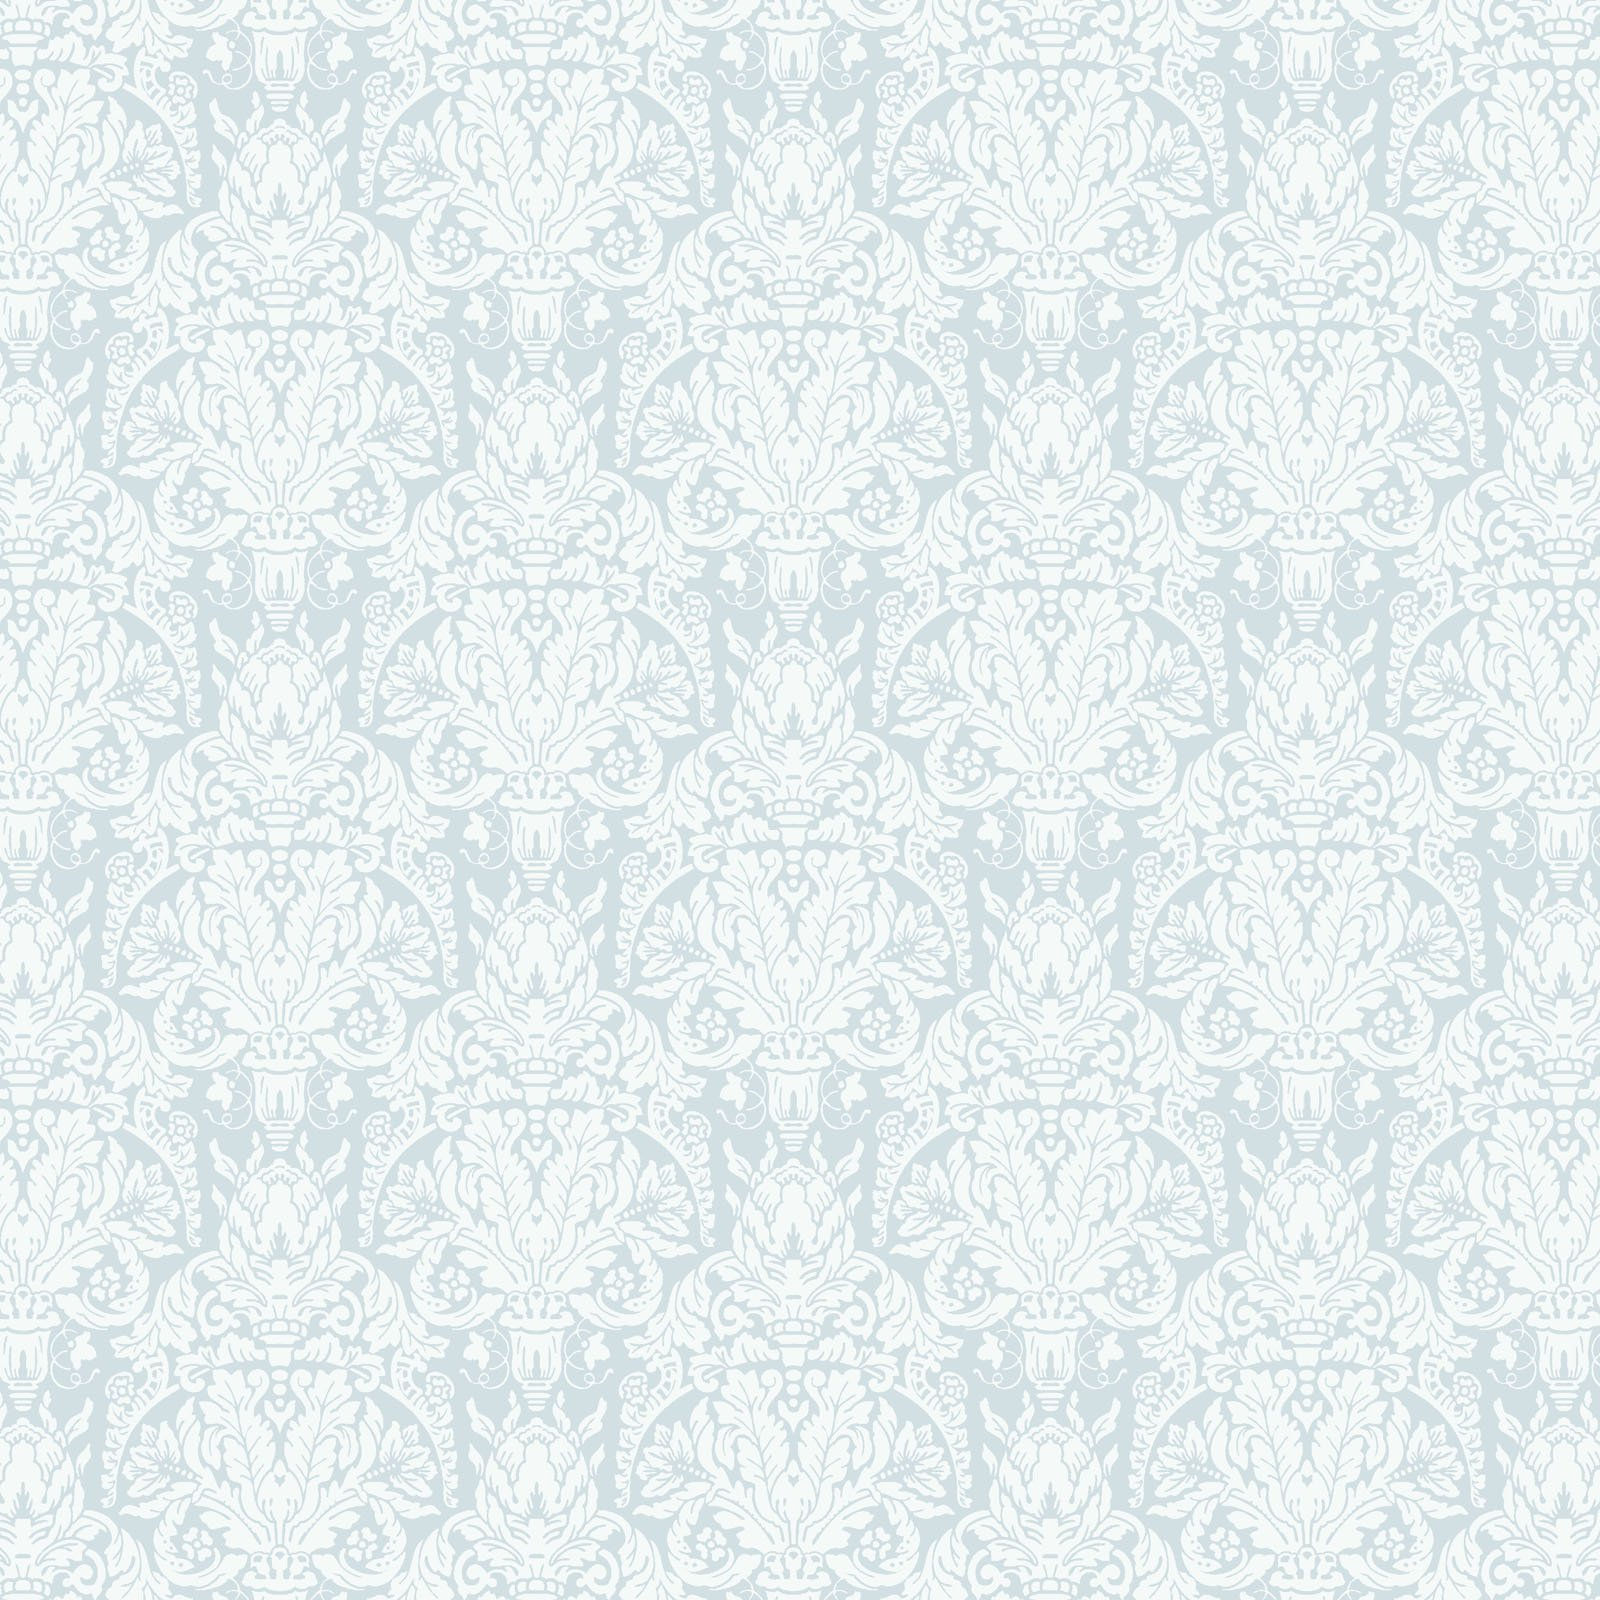 DANI-4510 B - DANIELLA BY P&B BOUTIQUE JACQUARD BLUE - ARRIVING IN OCTOBER 2021